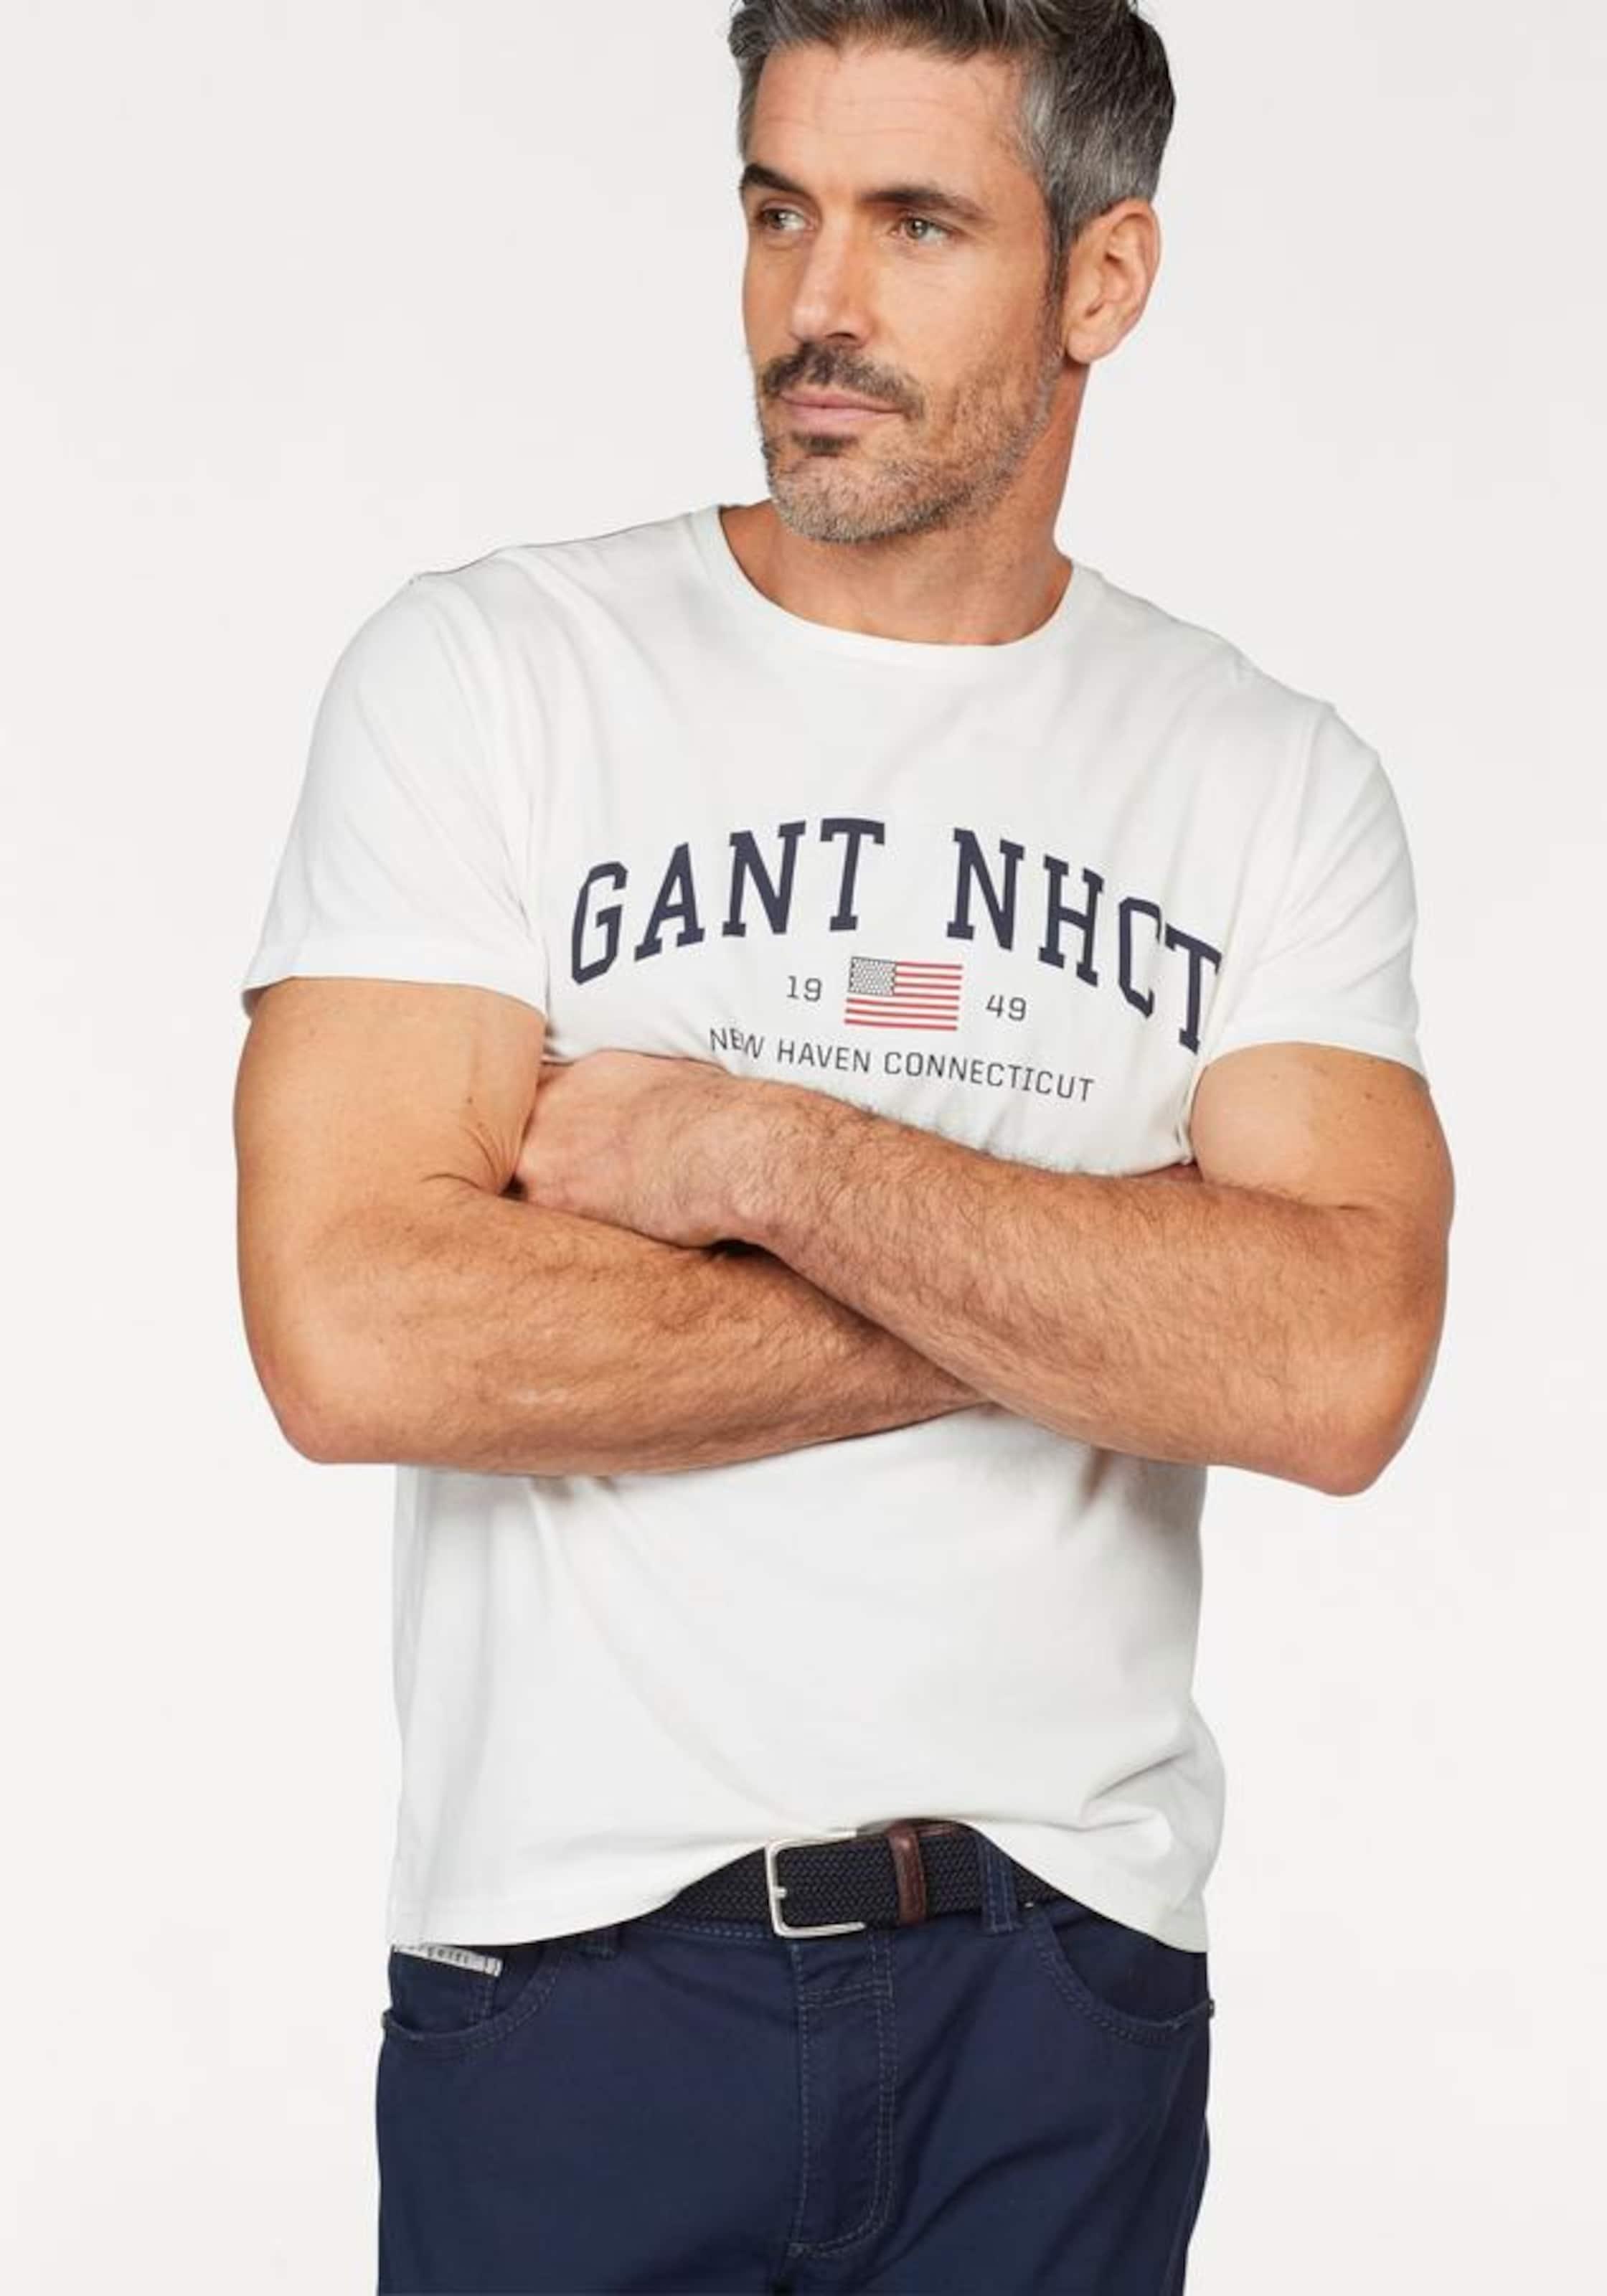 GANT T-Shirt mit Logo-Print 2018 Neue hM1rP59xE